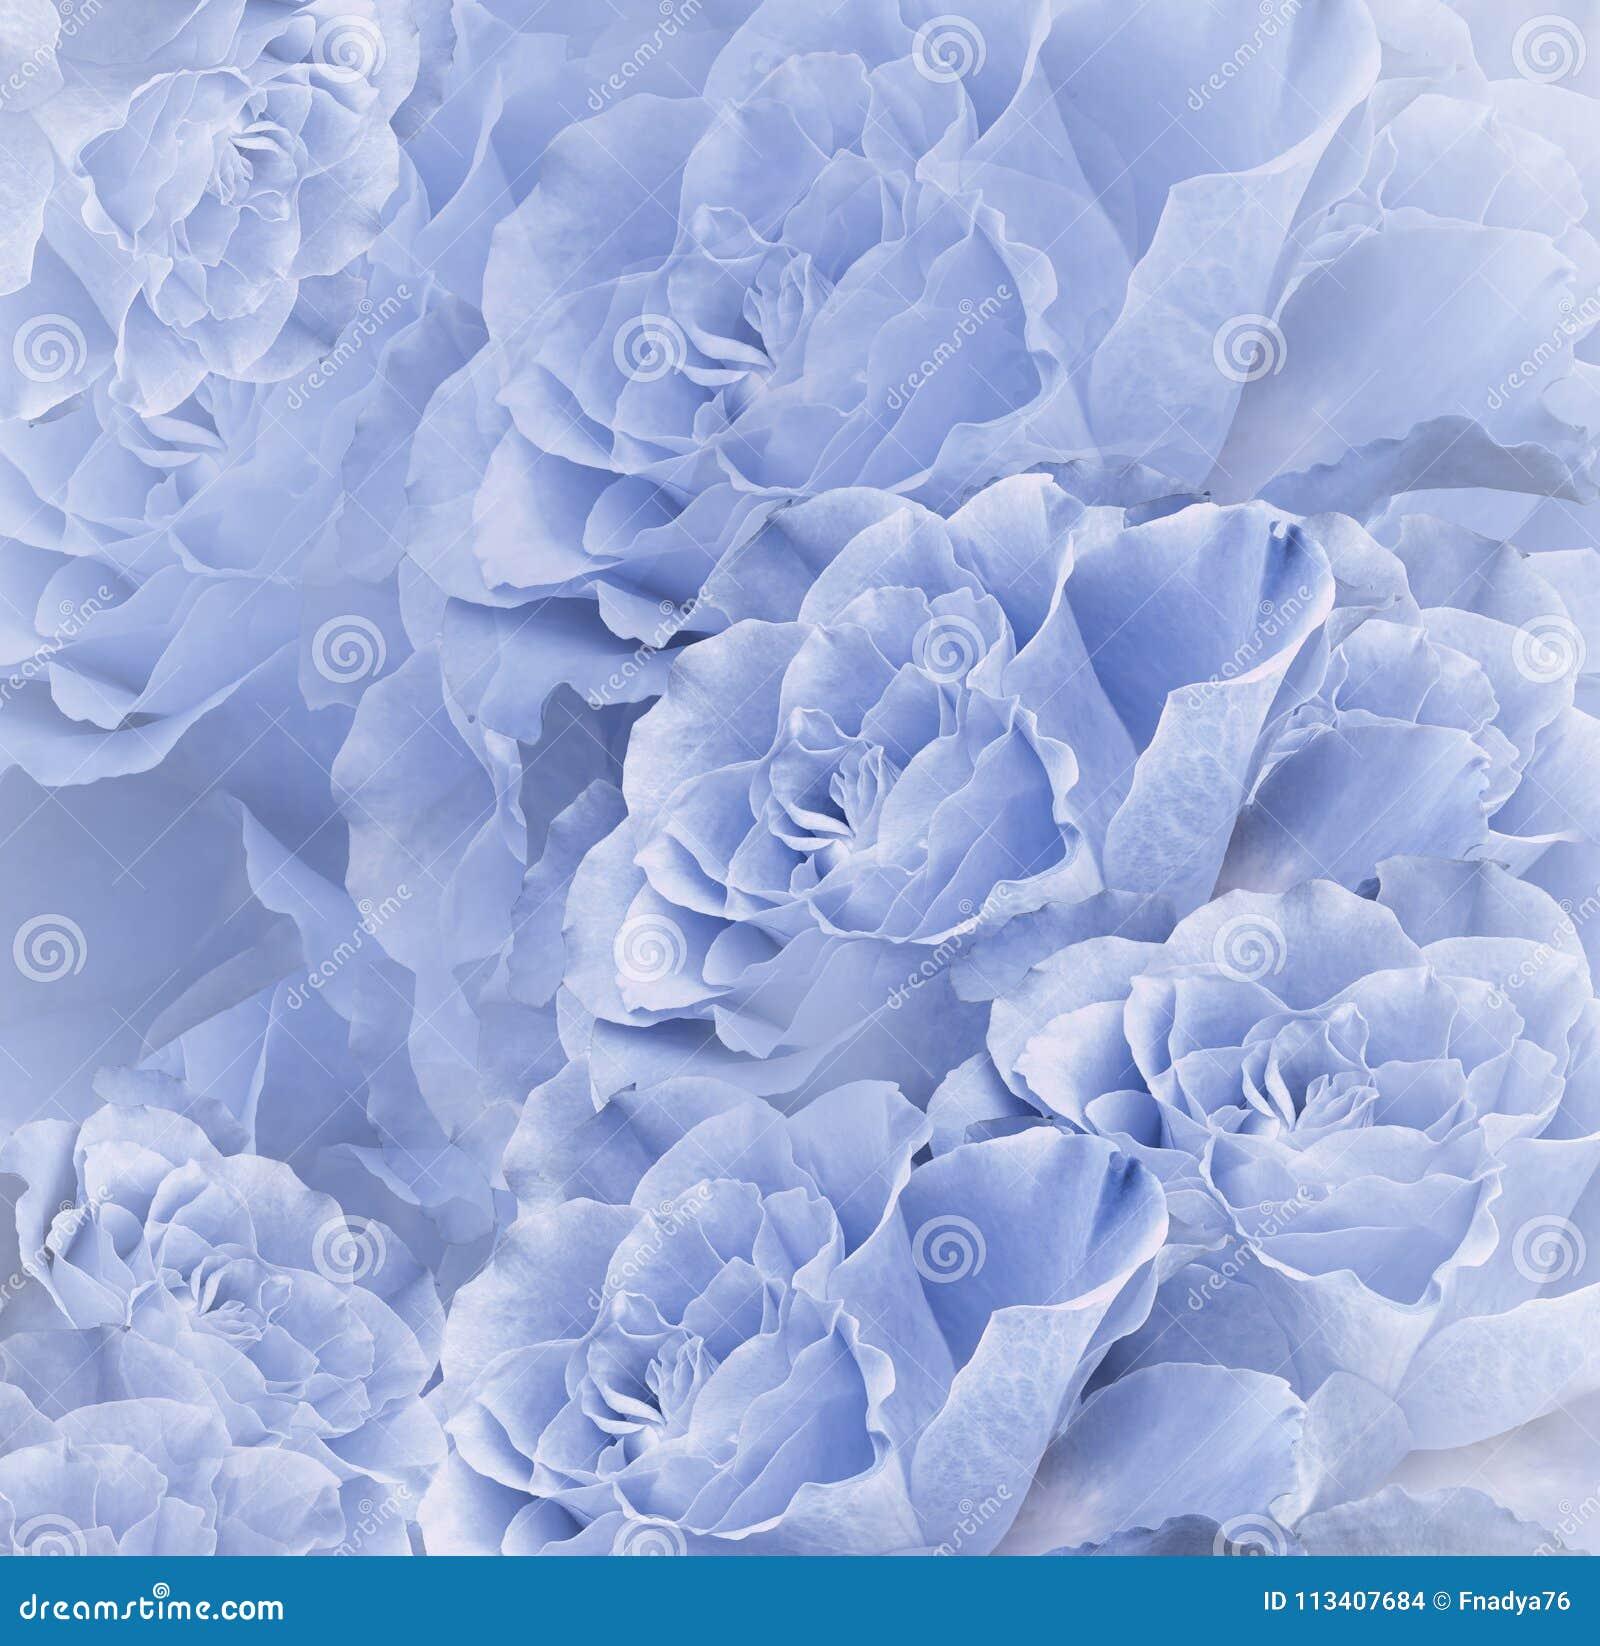 Floral Blue Beautiful Background Flower Composition Bouquet Of